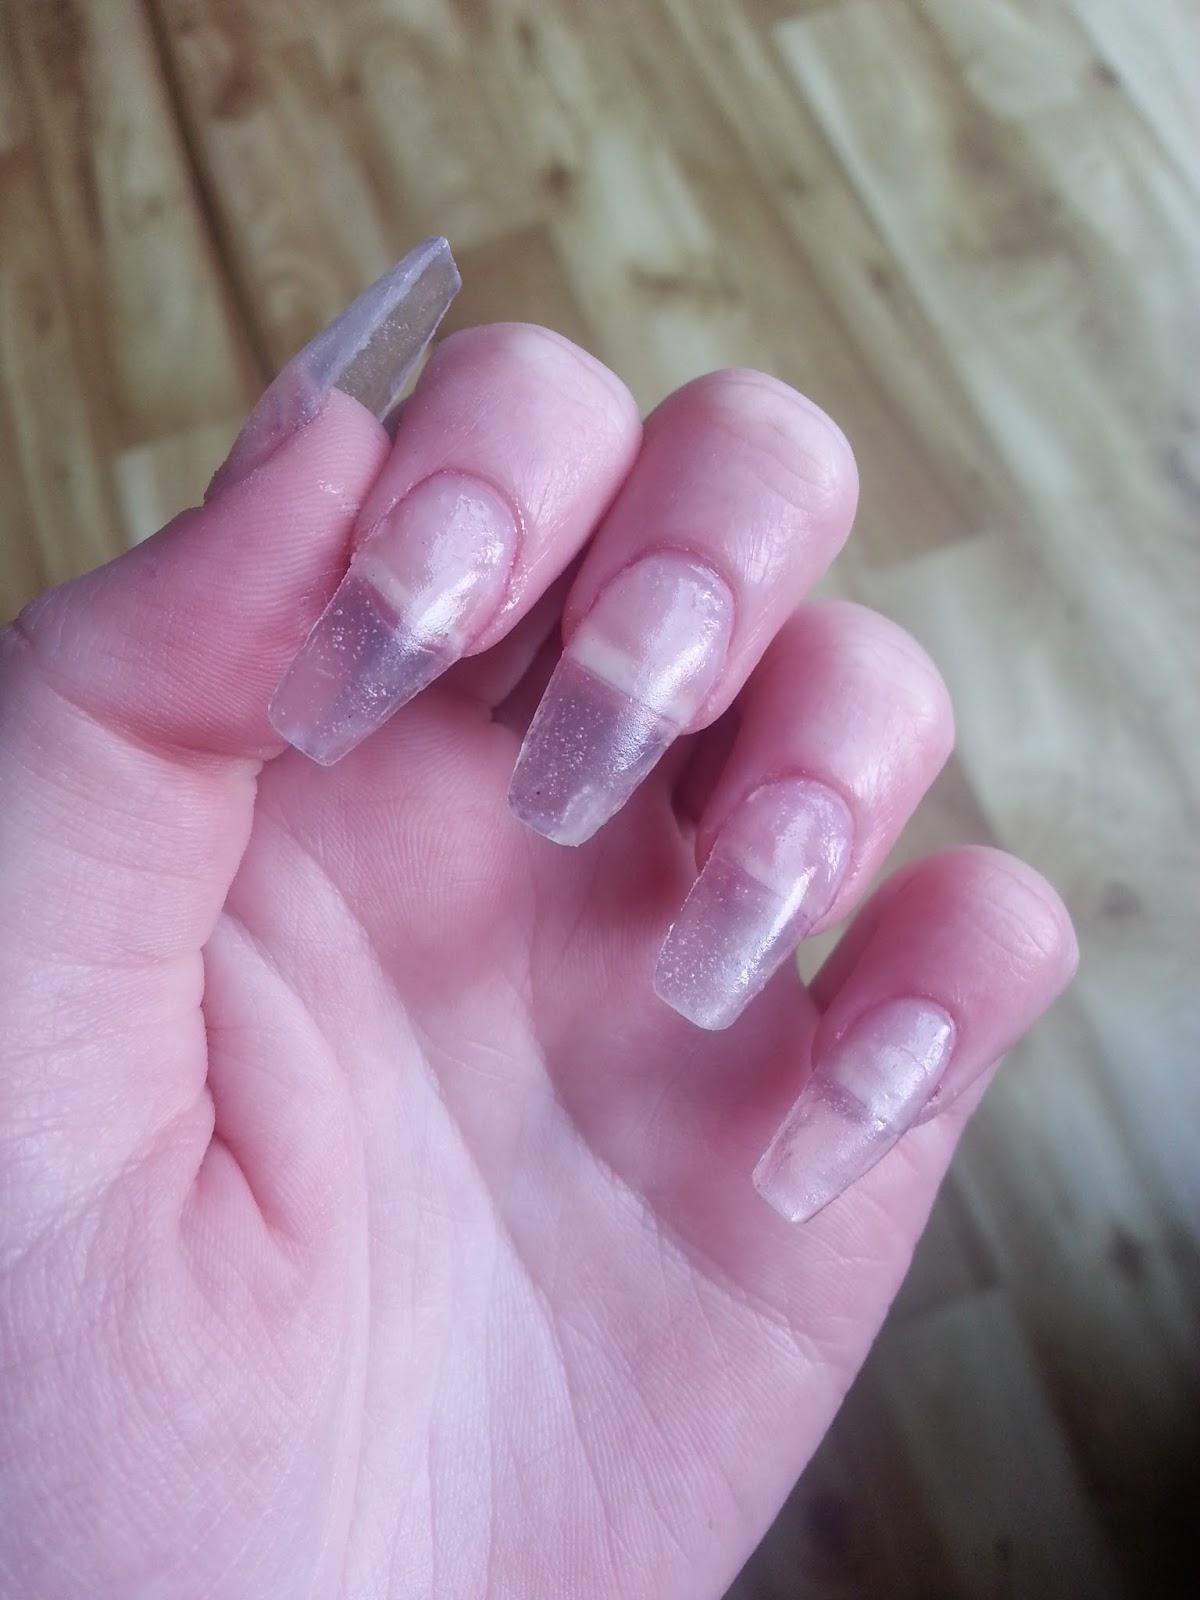 DIY Acrylic Nails   ManiMonay - Fake Nails & Mascara - Irish Beauty ...